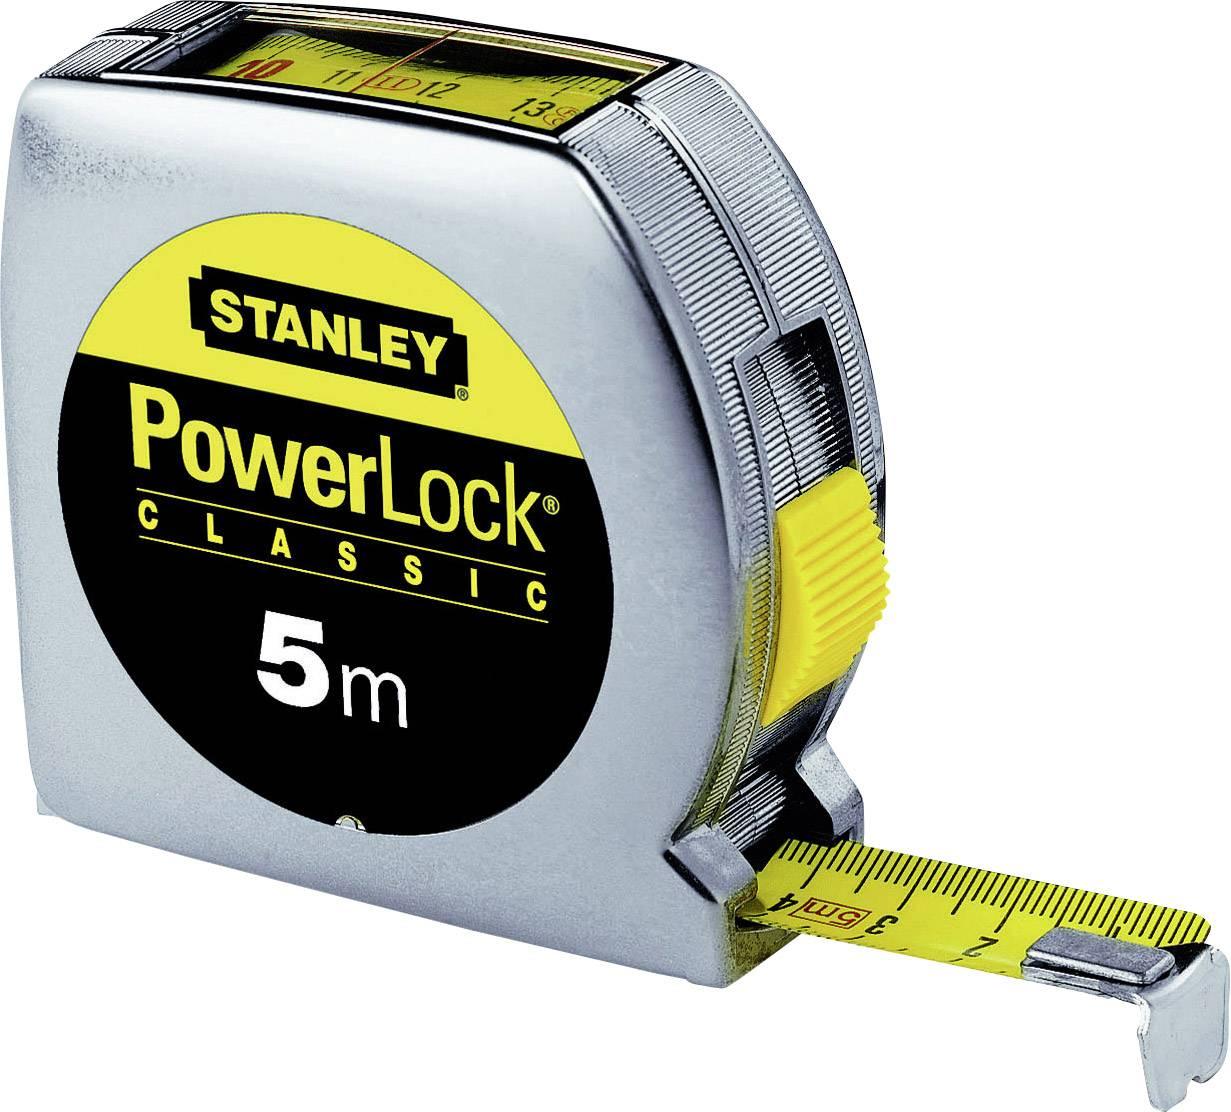 Svinovací metr Stanley by Black & Decker 0-33-932 0-33-932